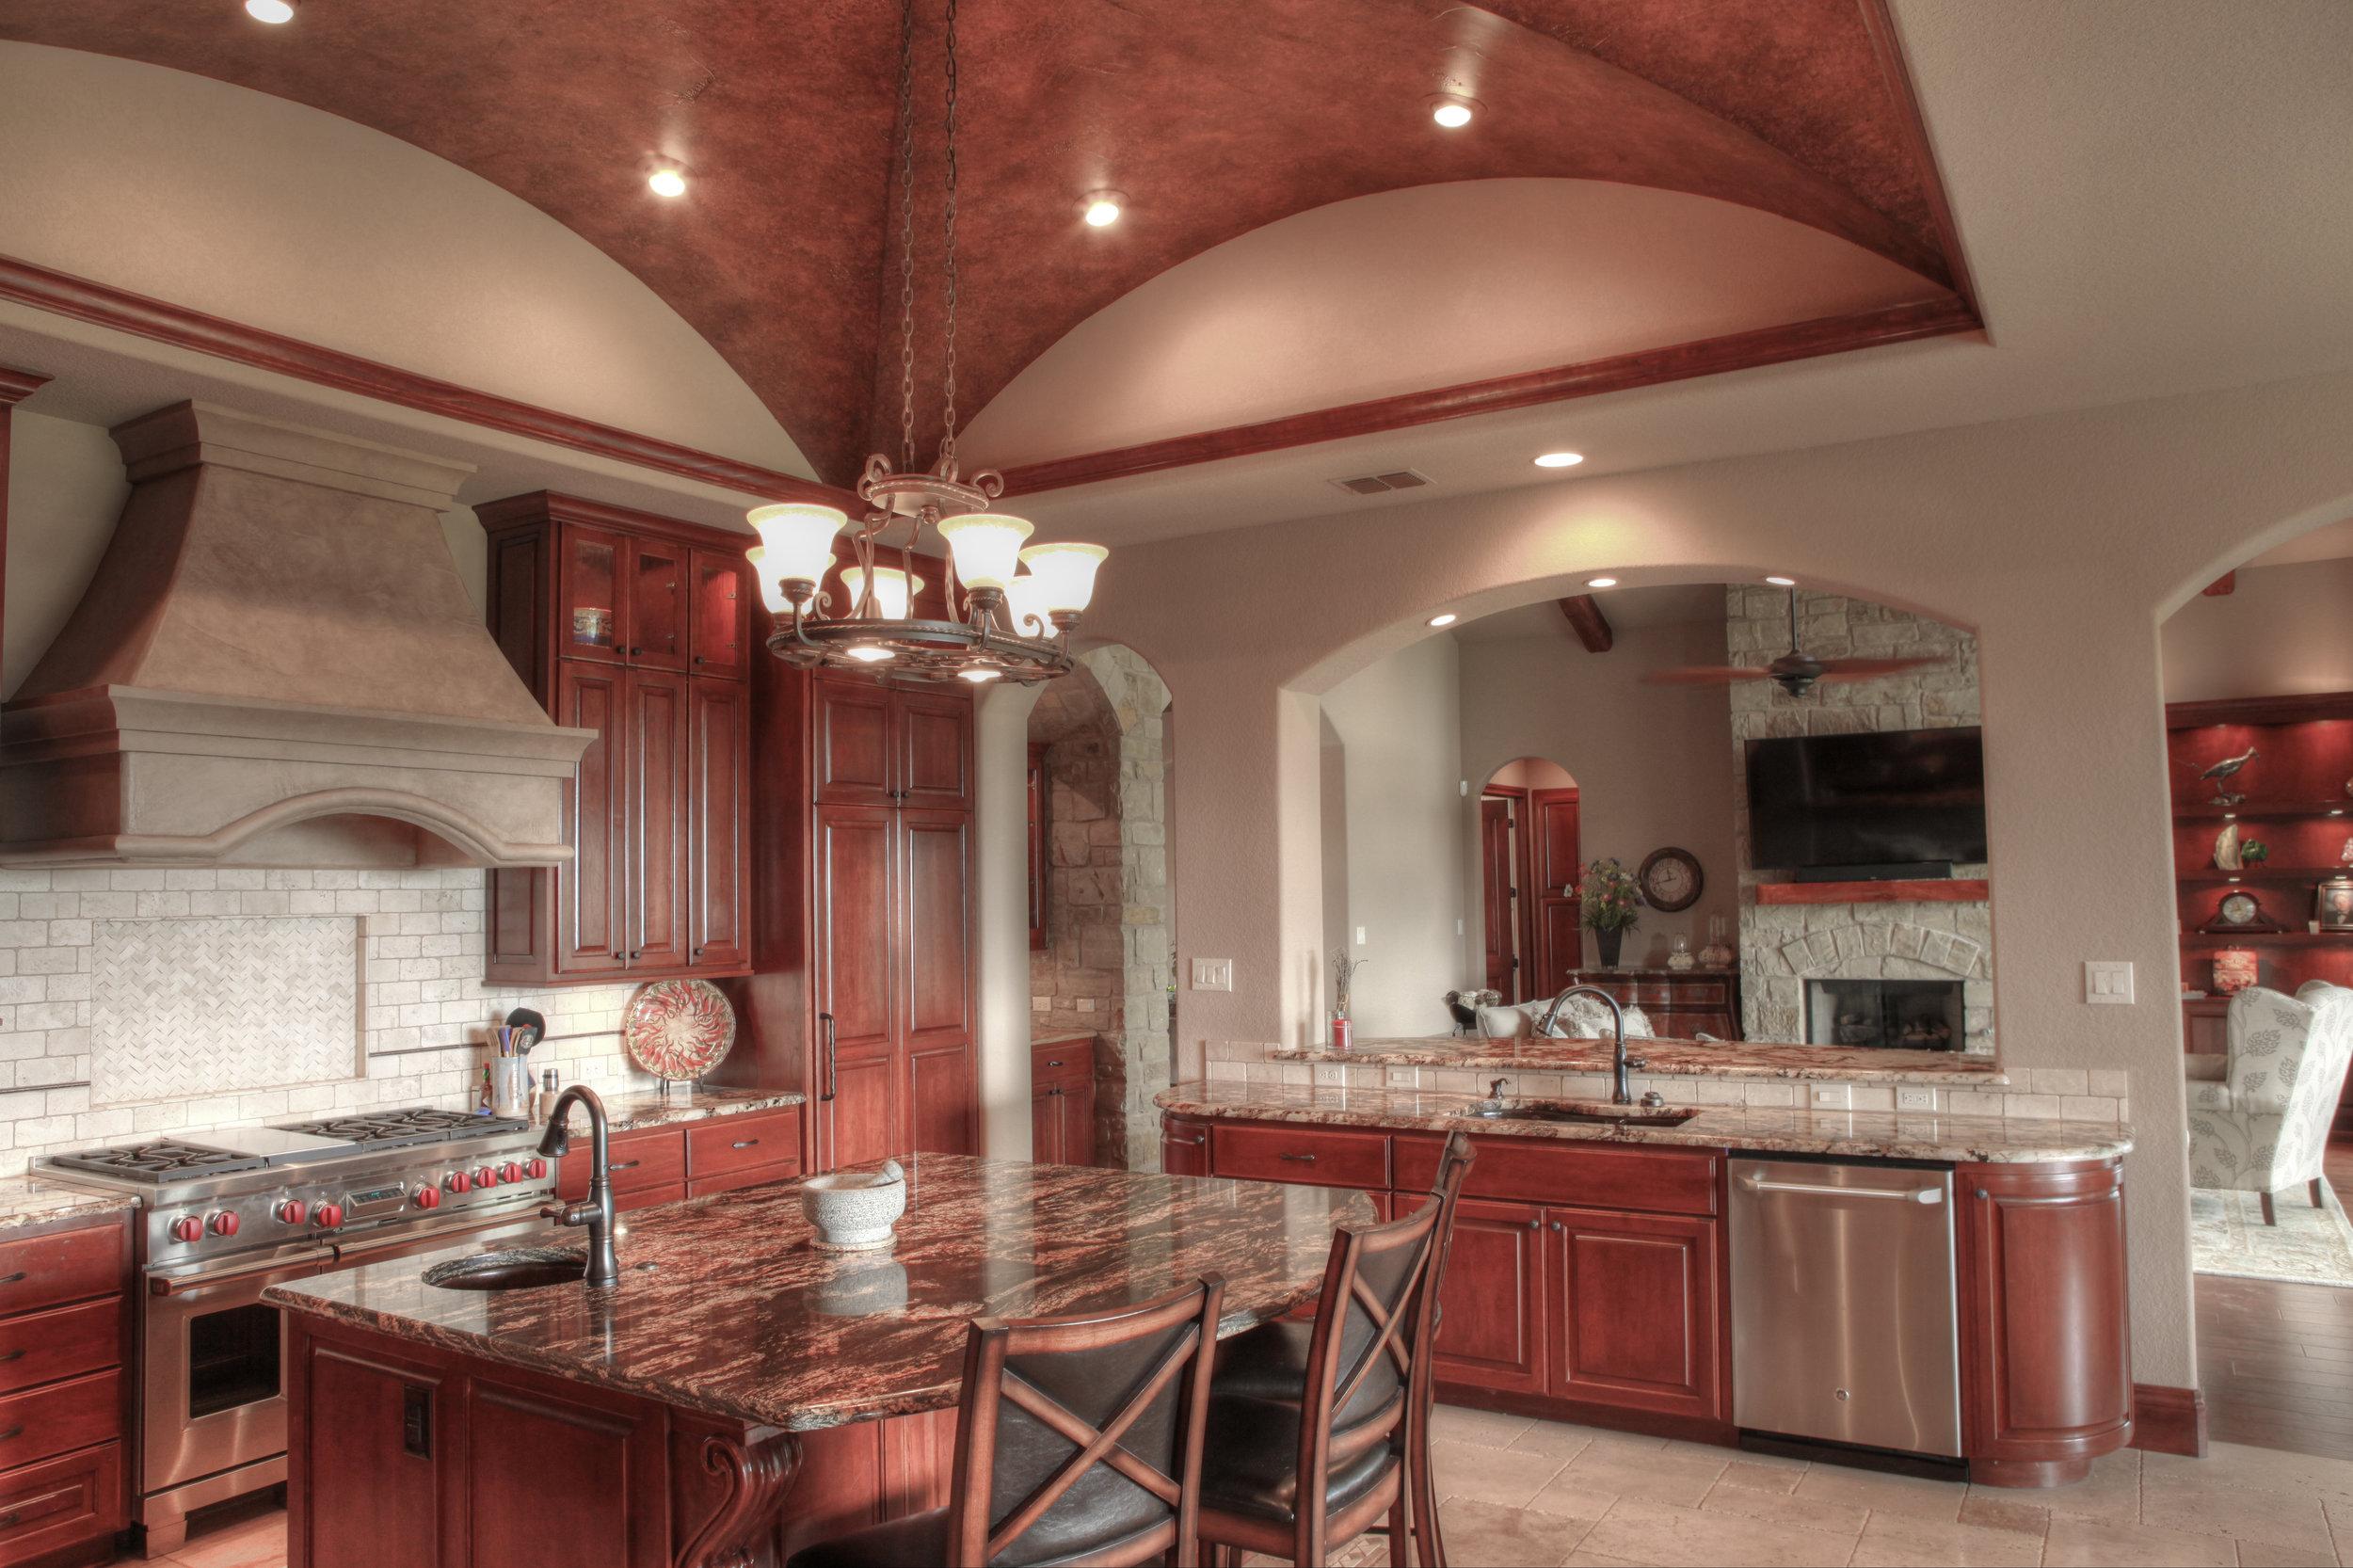 19-kitchen_living 3.jpg